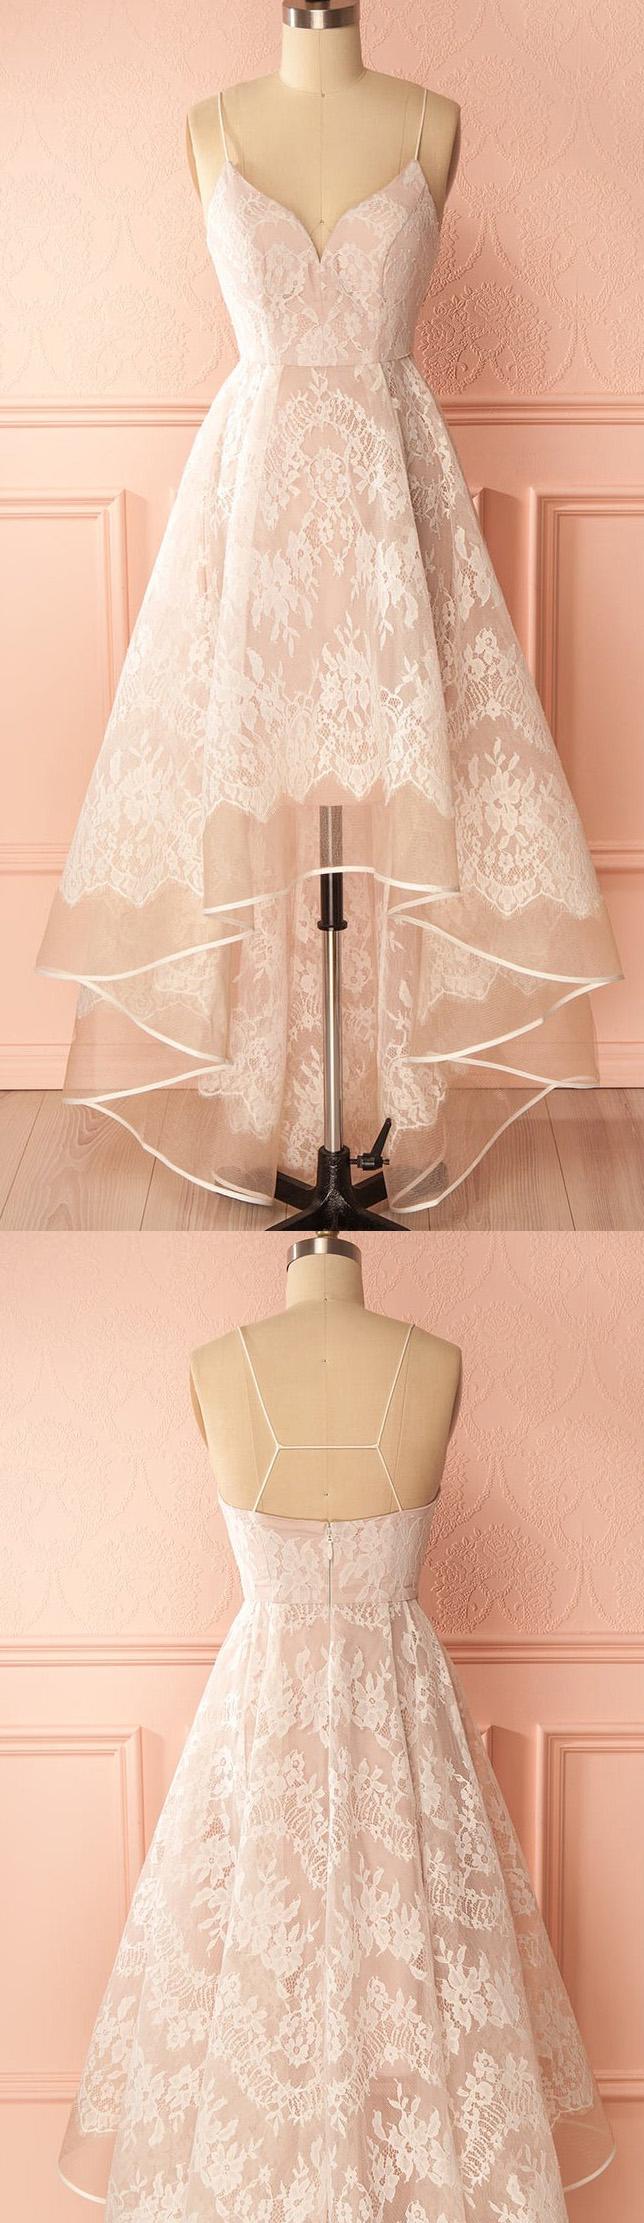 Hot sale sleeveless pink prom evening dresses appealing short aline